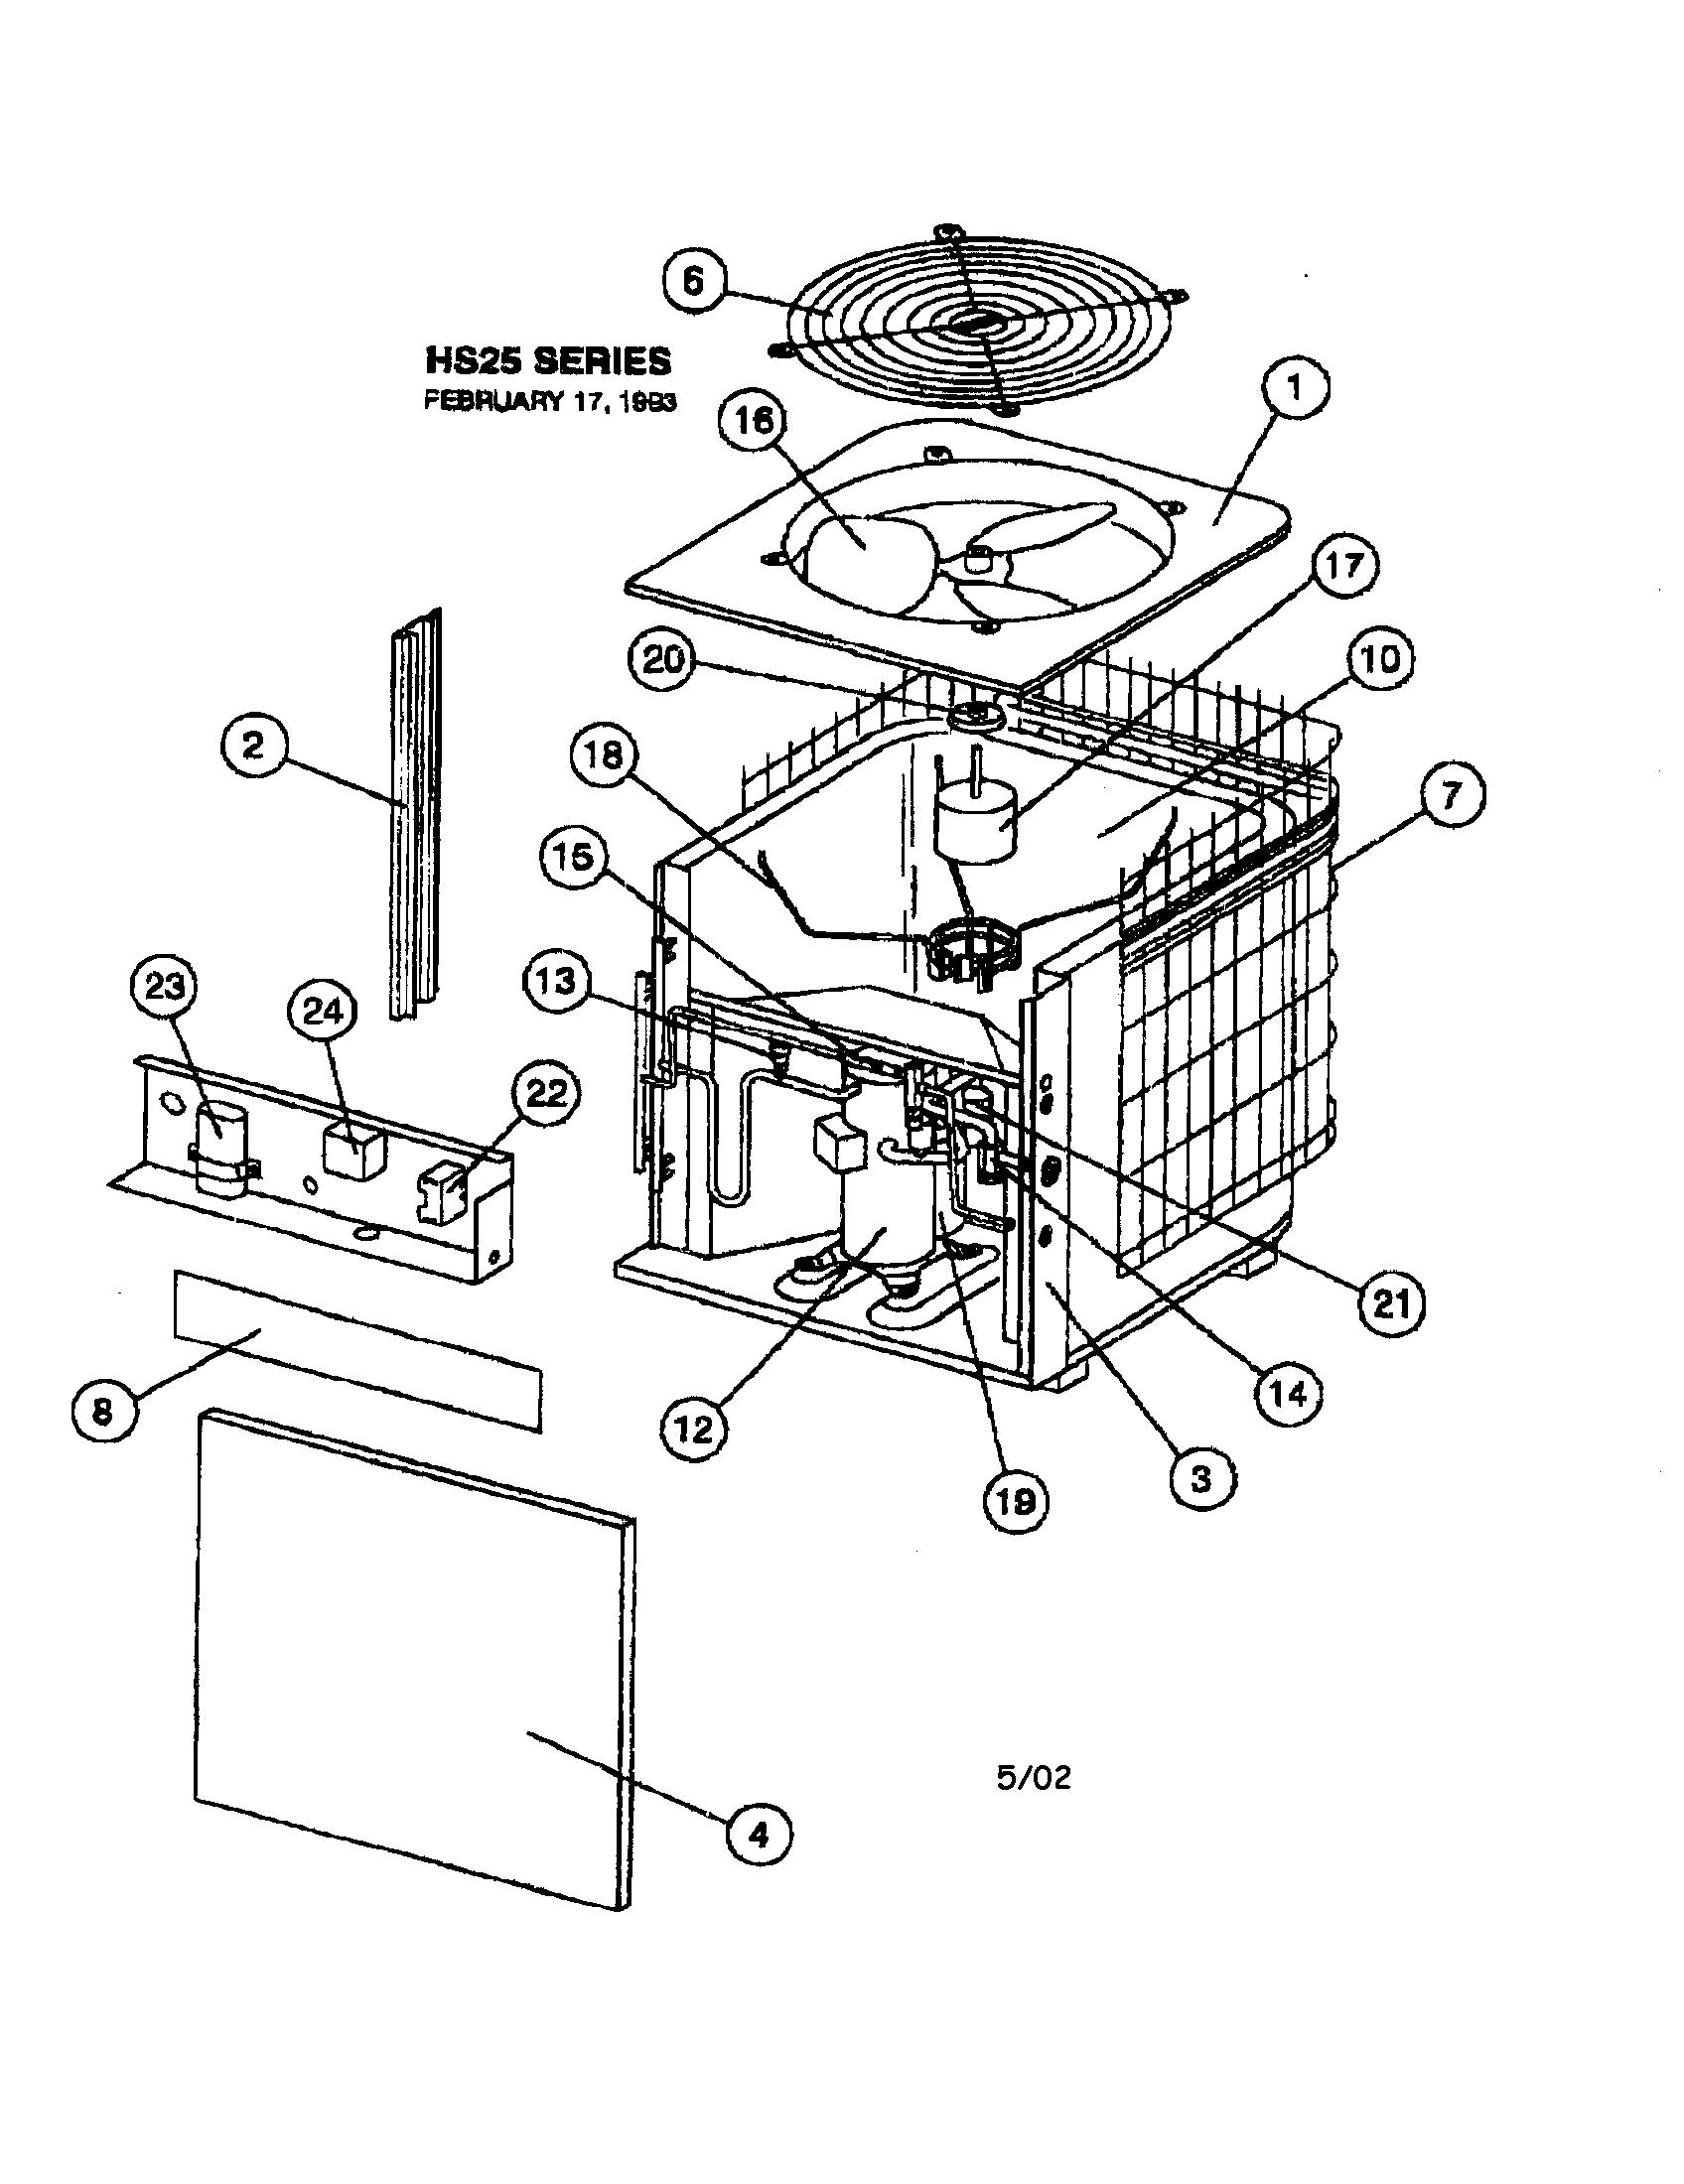 Heat Pump Parts Diagram : parts, diagram, Diagram, Parts, Wiring, Database